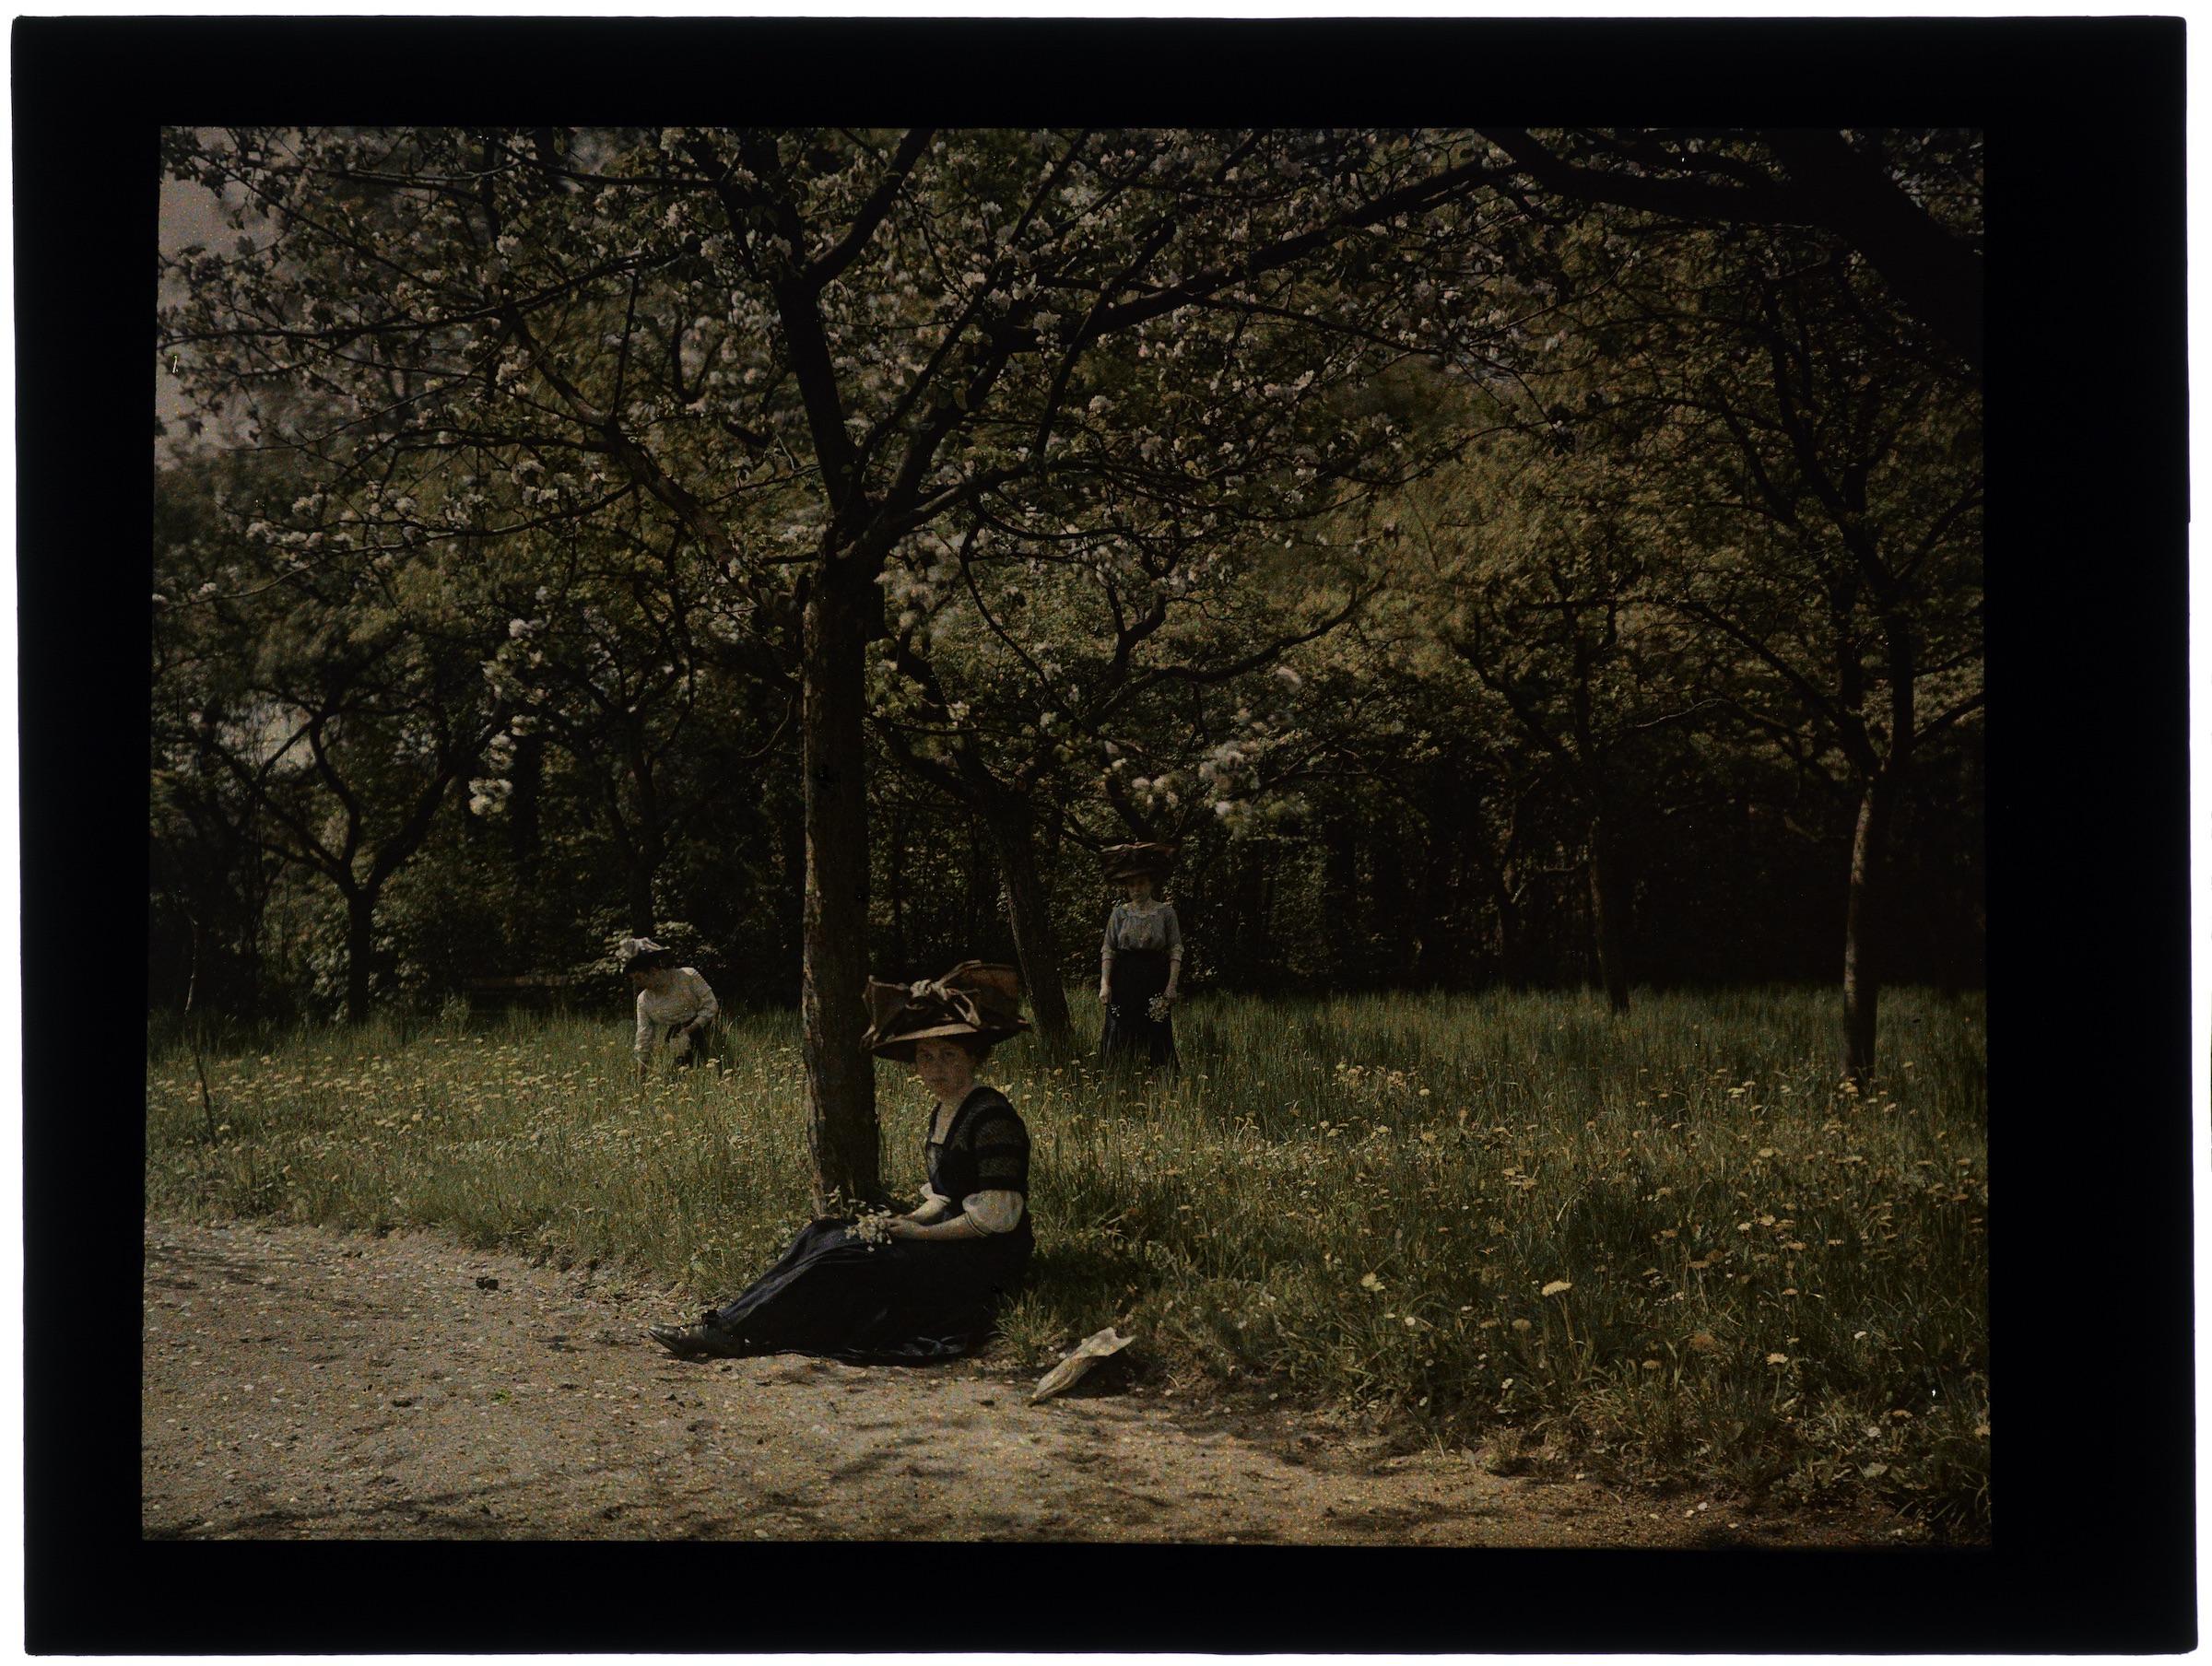 Femme au jardin fleuri